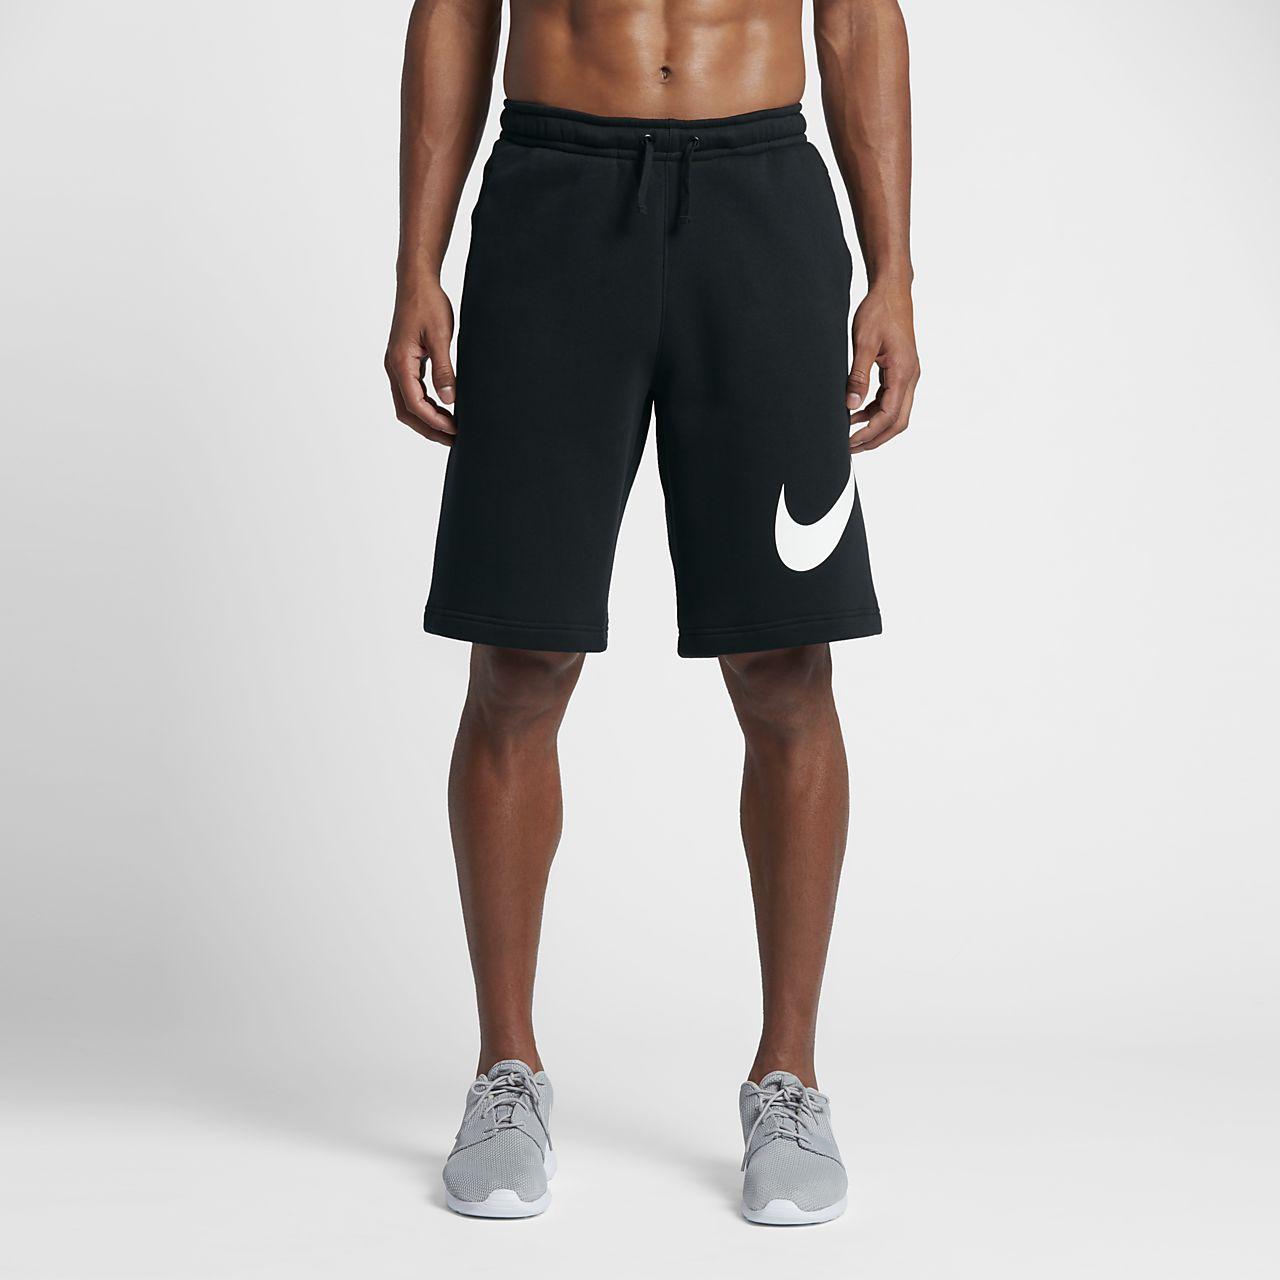 81d46701ff1a7f Nike Sportswear Club Fleece Men s Shorts. Nike.com